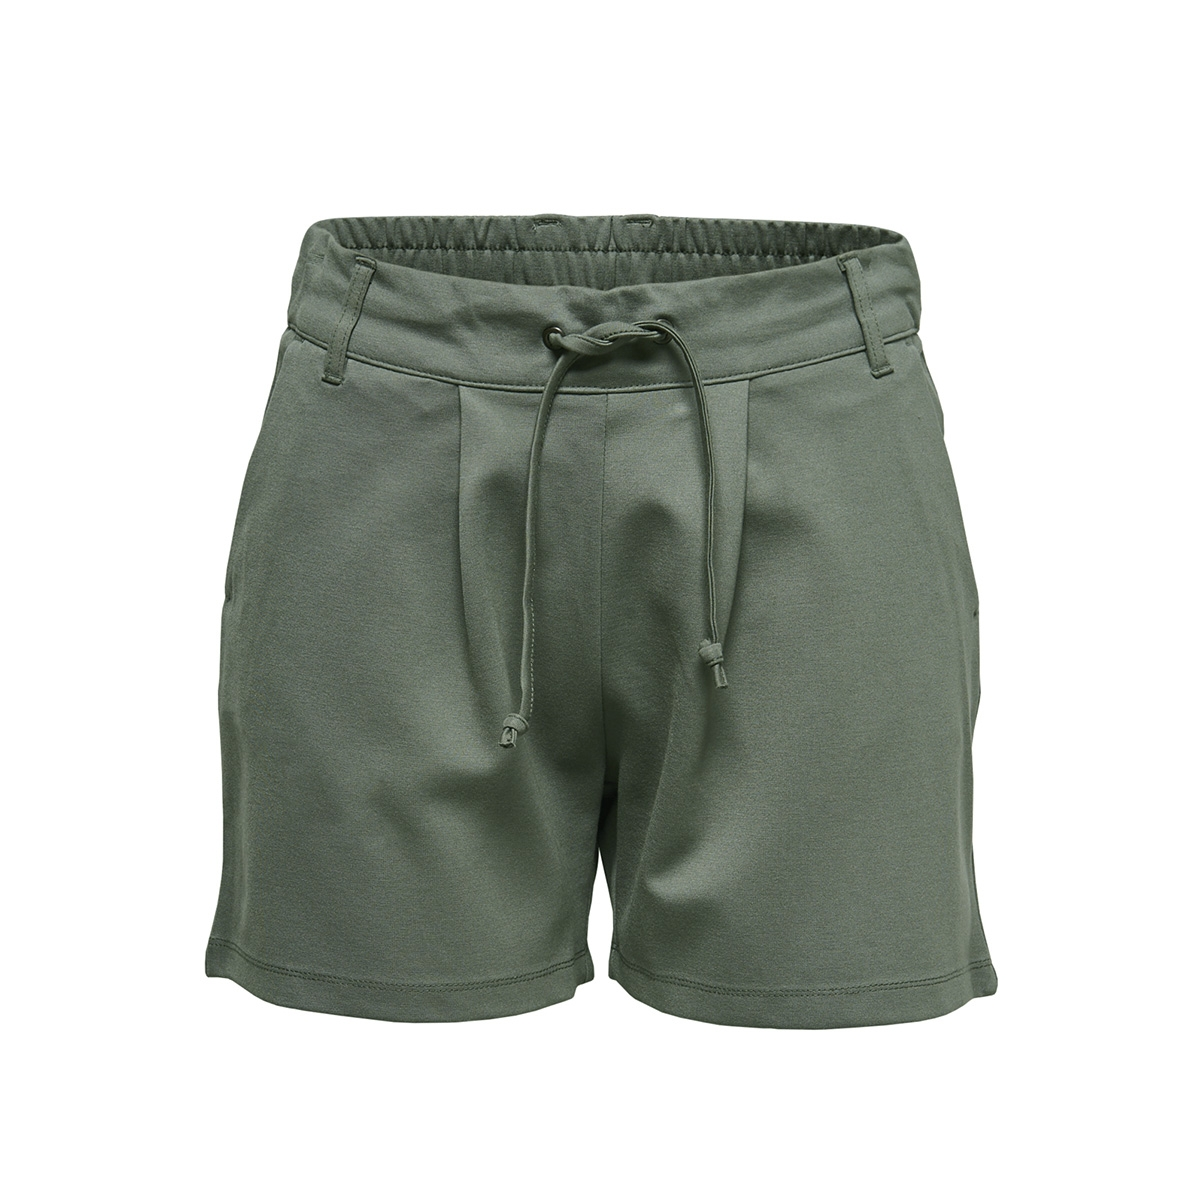 jdypretty shorts noos jrs rpt1 15147052 jacqueline de yong korte broek castor gray